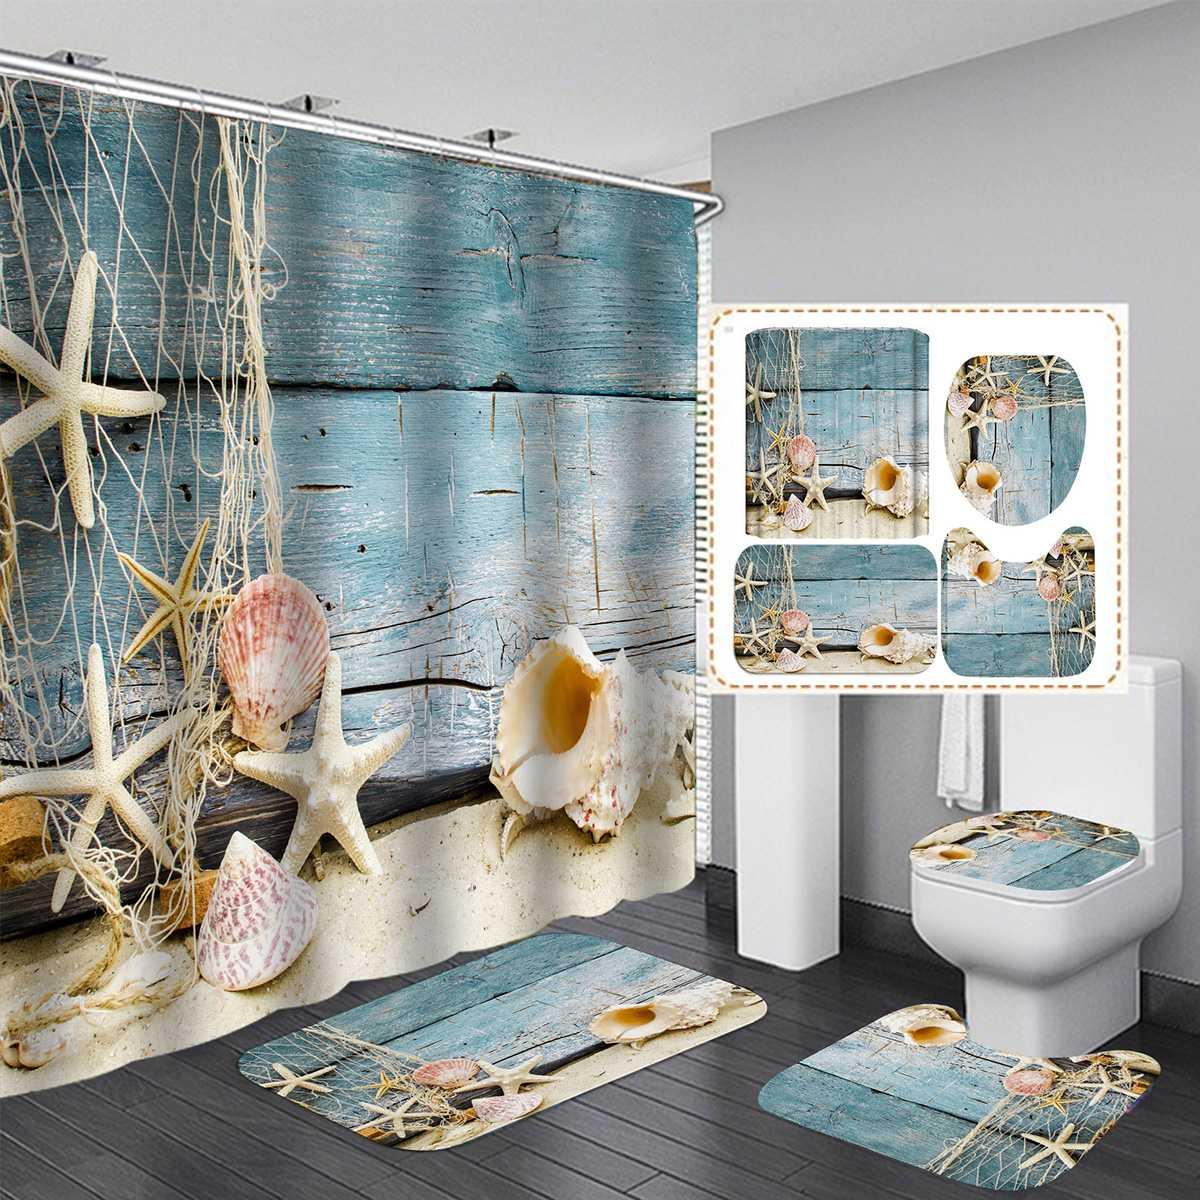 ocean beach summer theme shower curtain bathroom waterproof polyester shower curtain beach printing curtains for bathroom shower